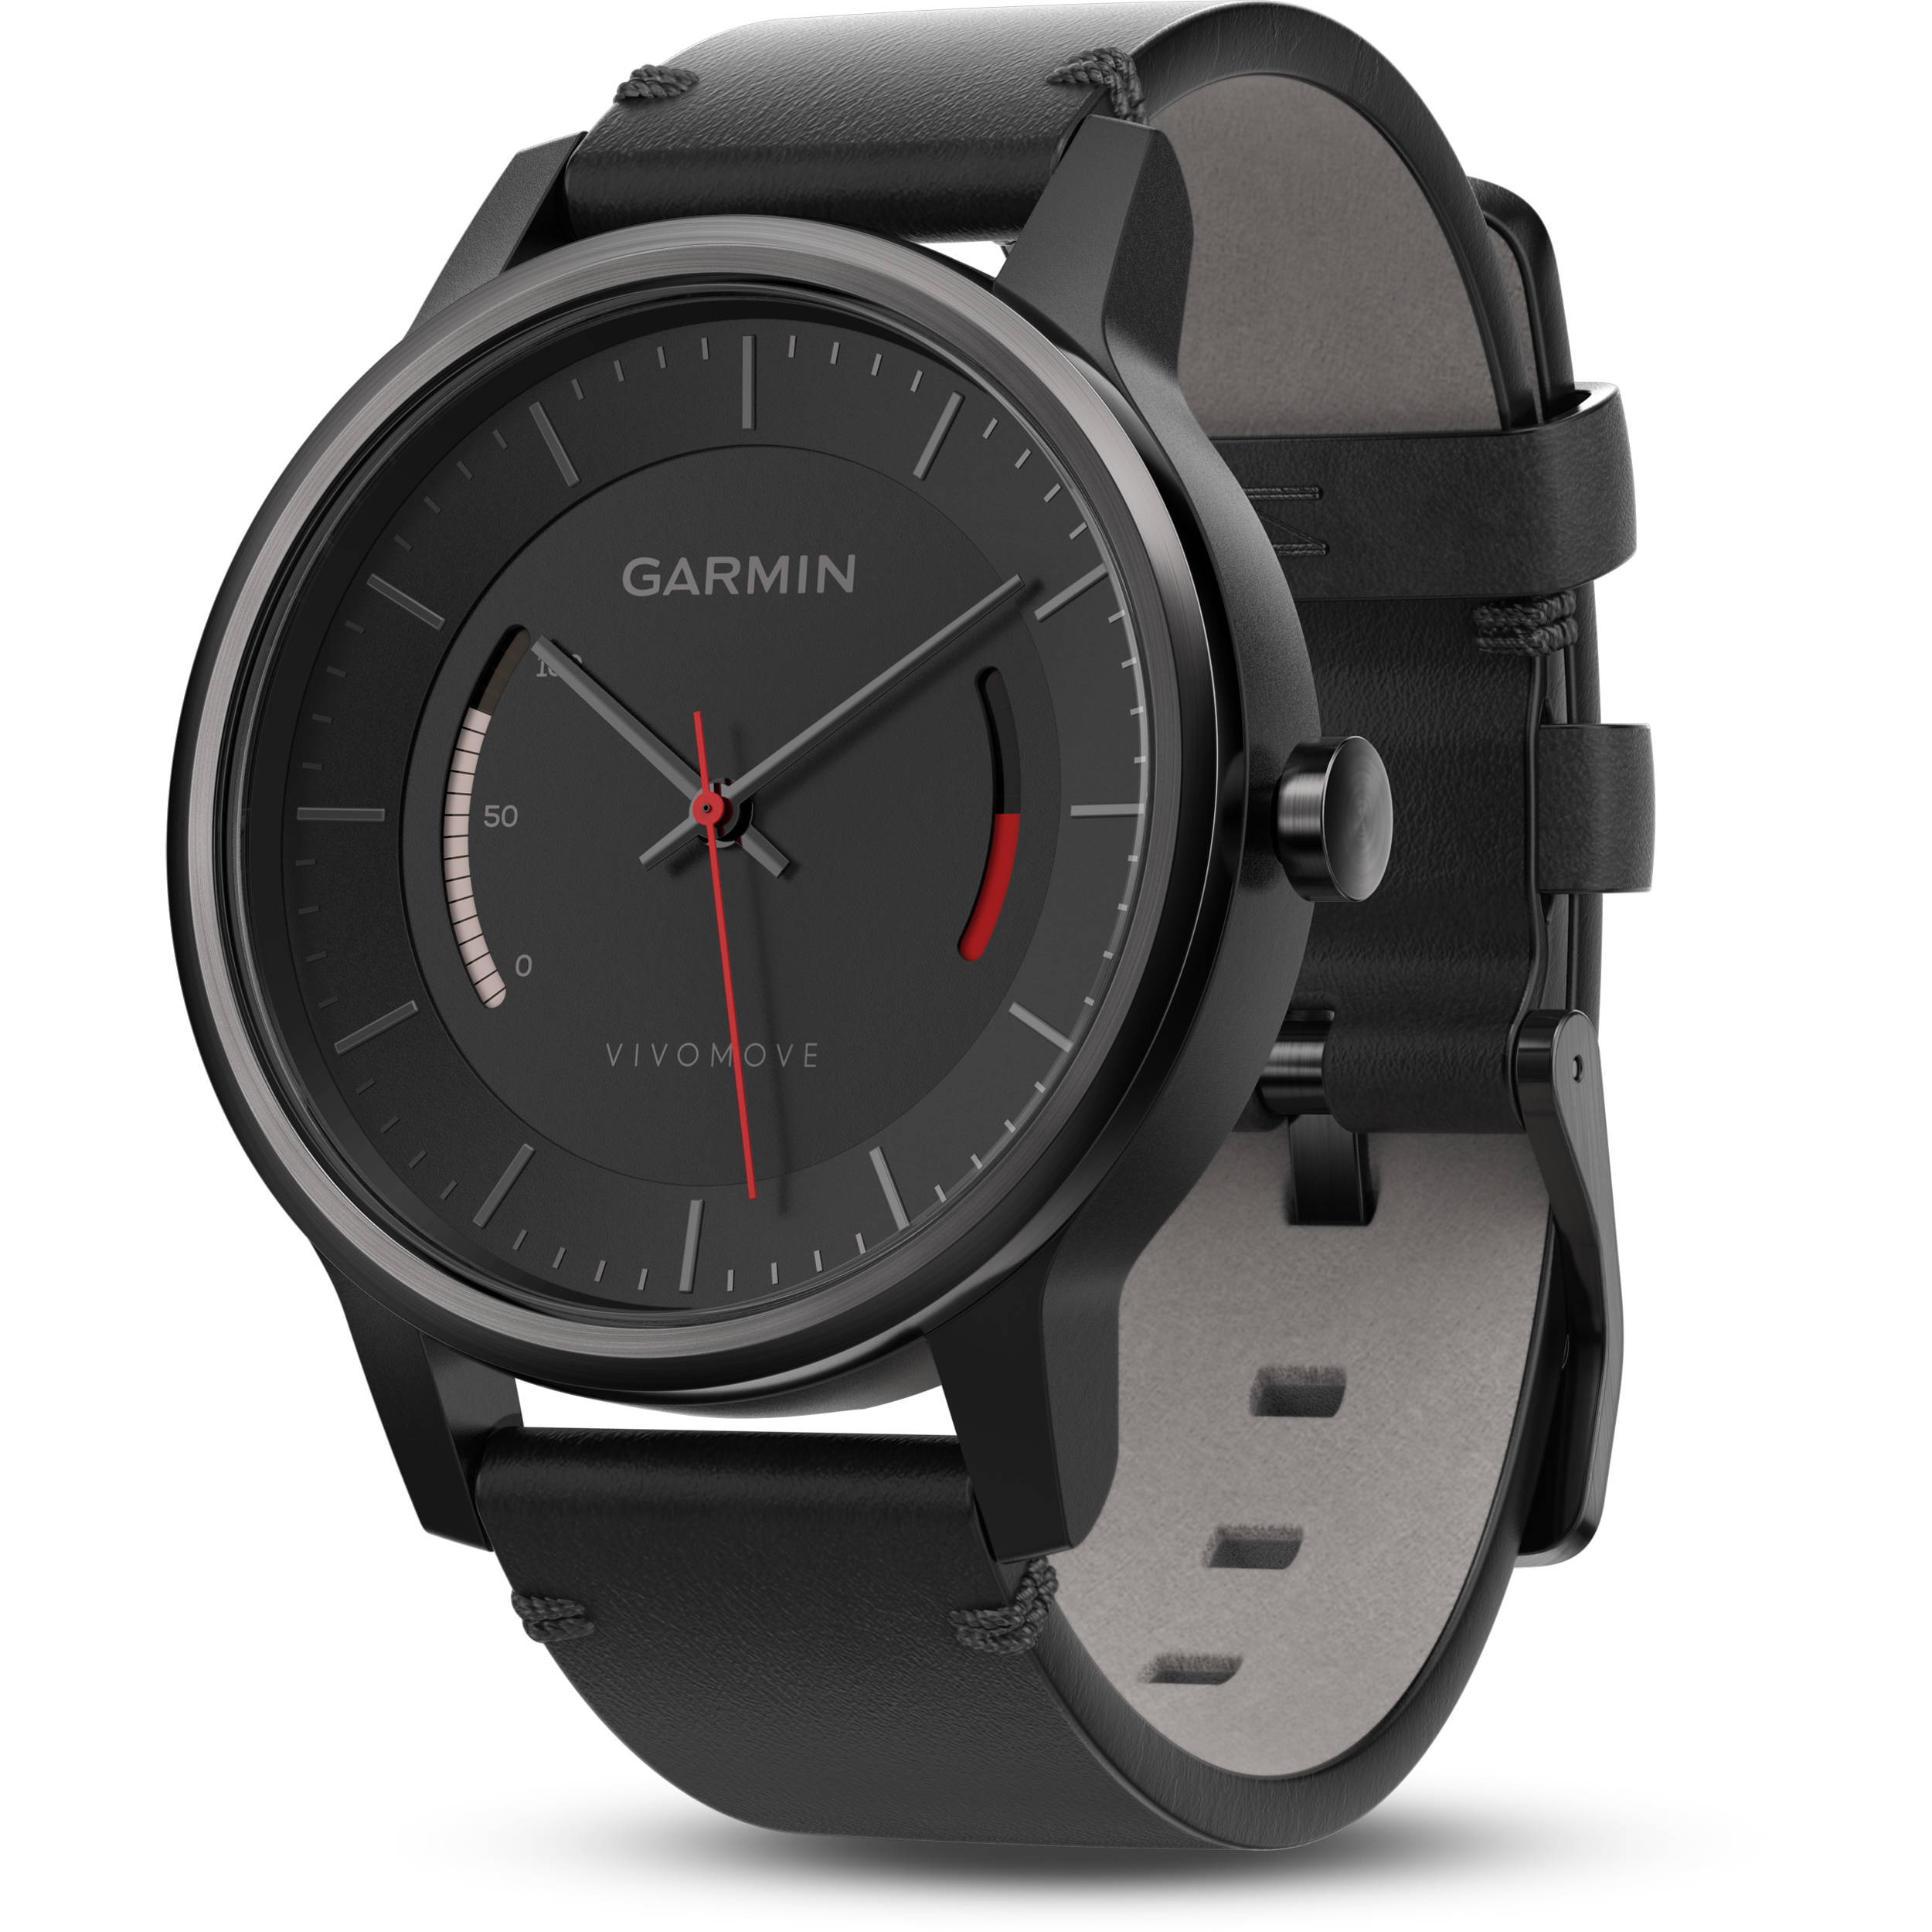 Garmin Vivomove Classic Activity Tracking Watch 010 01597